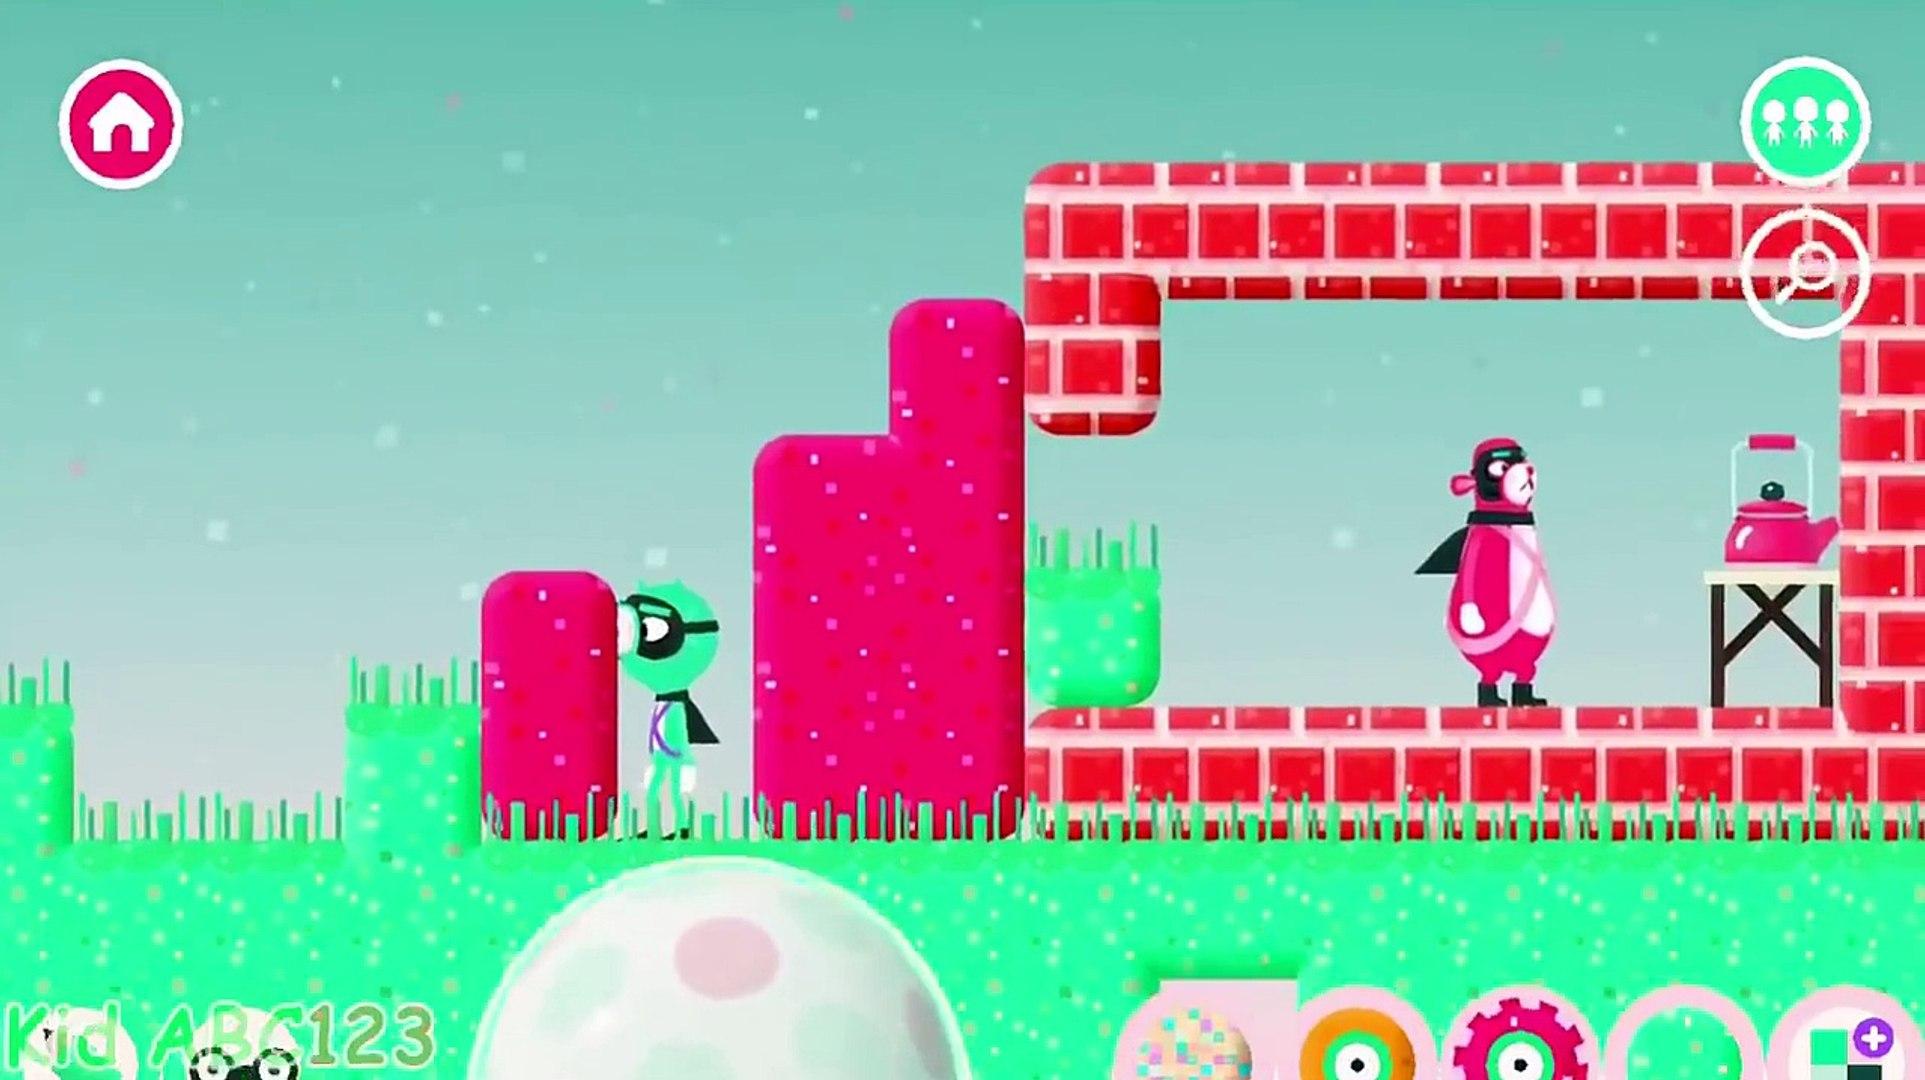 Toca Blocks Game (Toca Boca) Part 1 - Education Apps for Kids